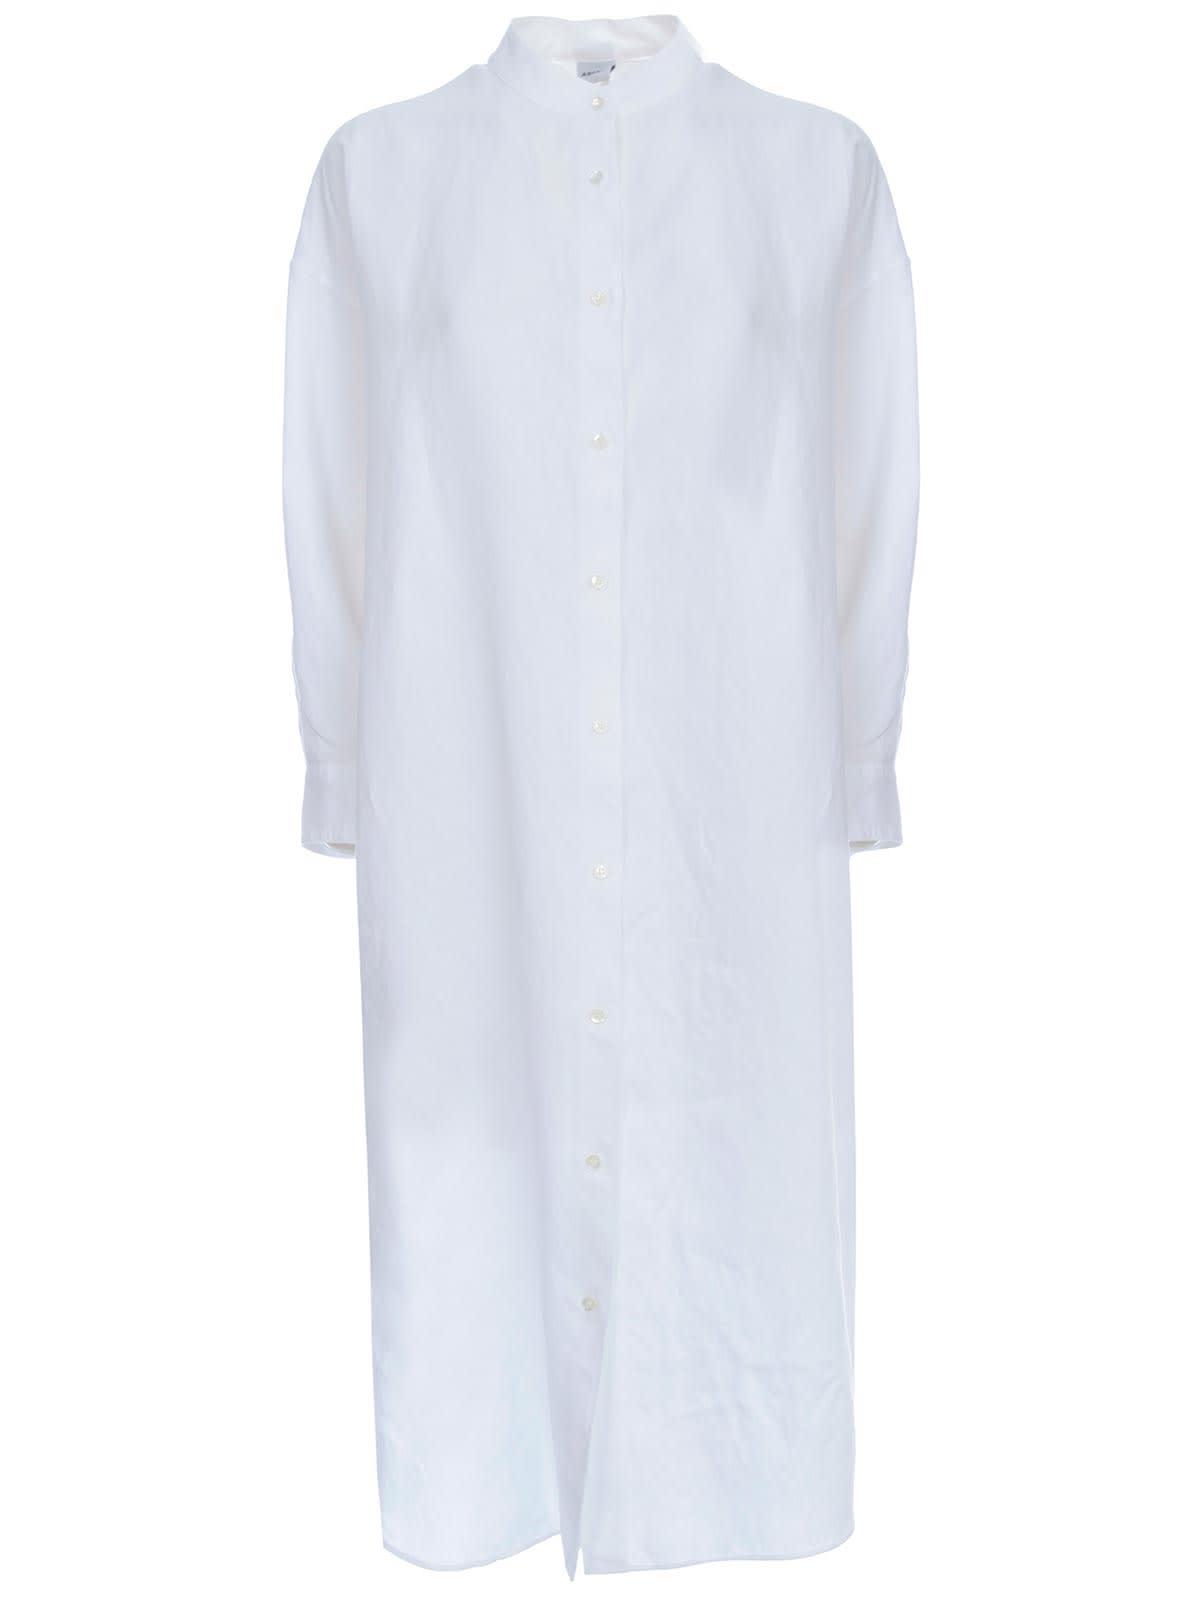 Buy Aspesi Dress L/s Guru Neck Rounded Bottom online, shop Aspesi with free shipping